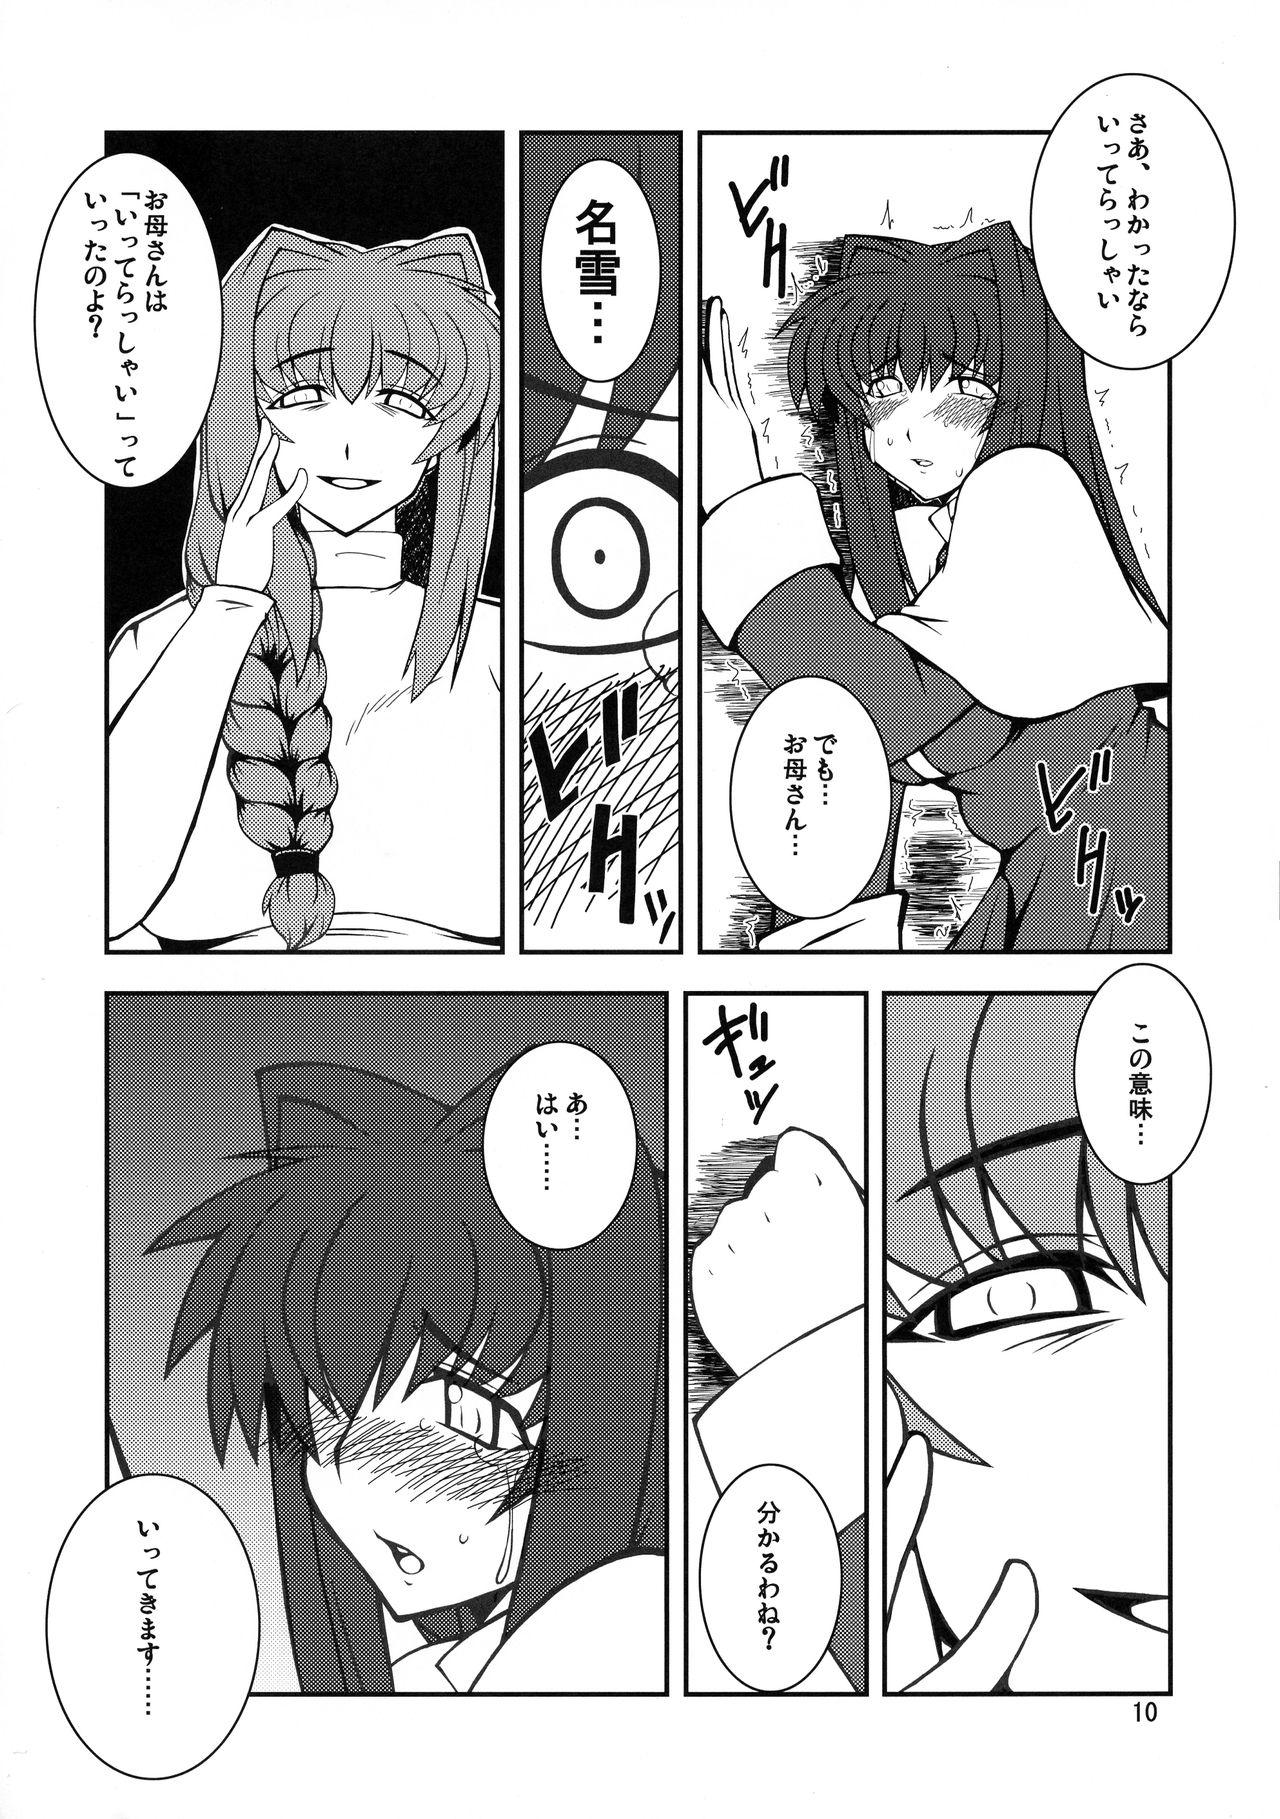 Kyouki Vol. 3~5 Remake Ver. 9